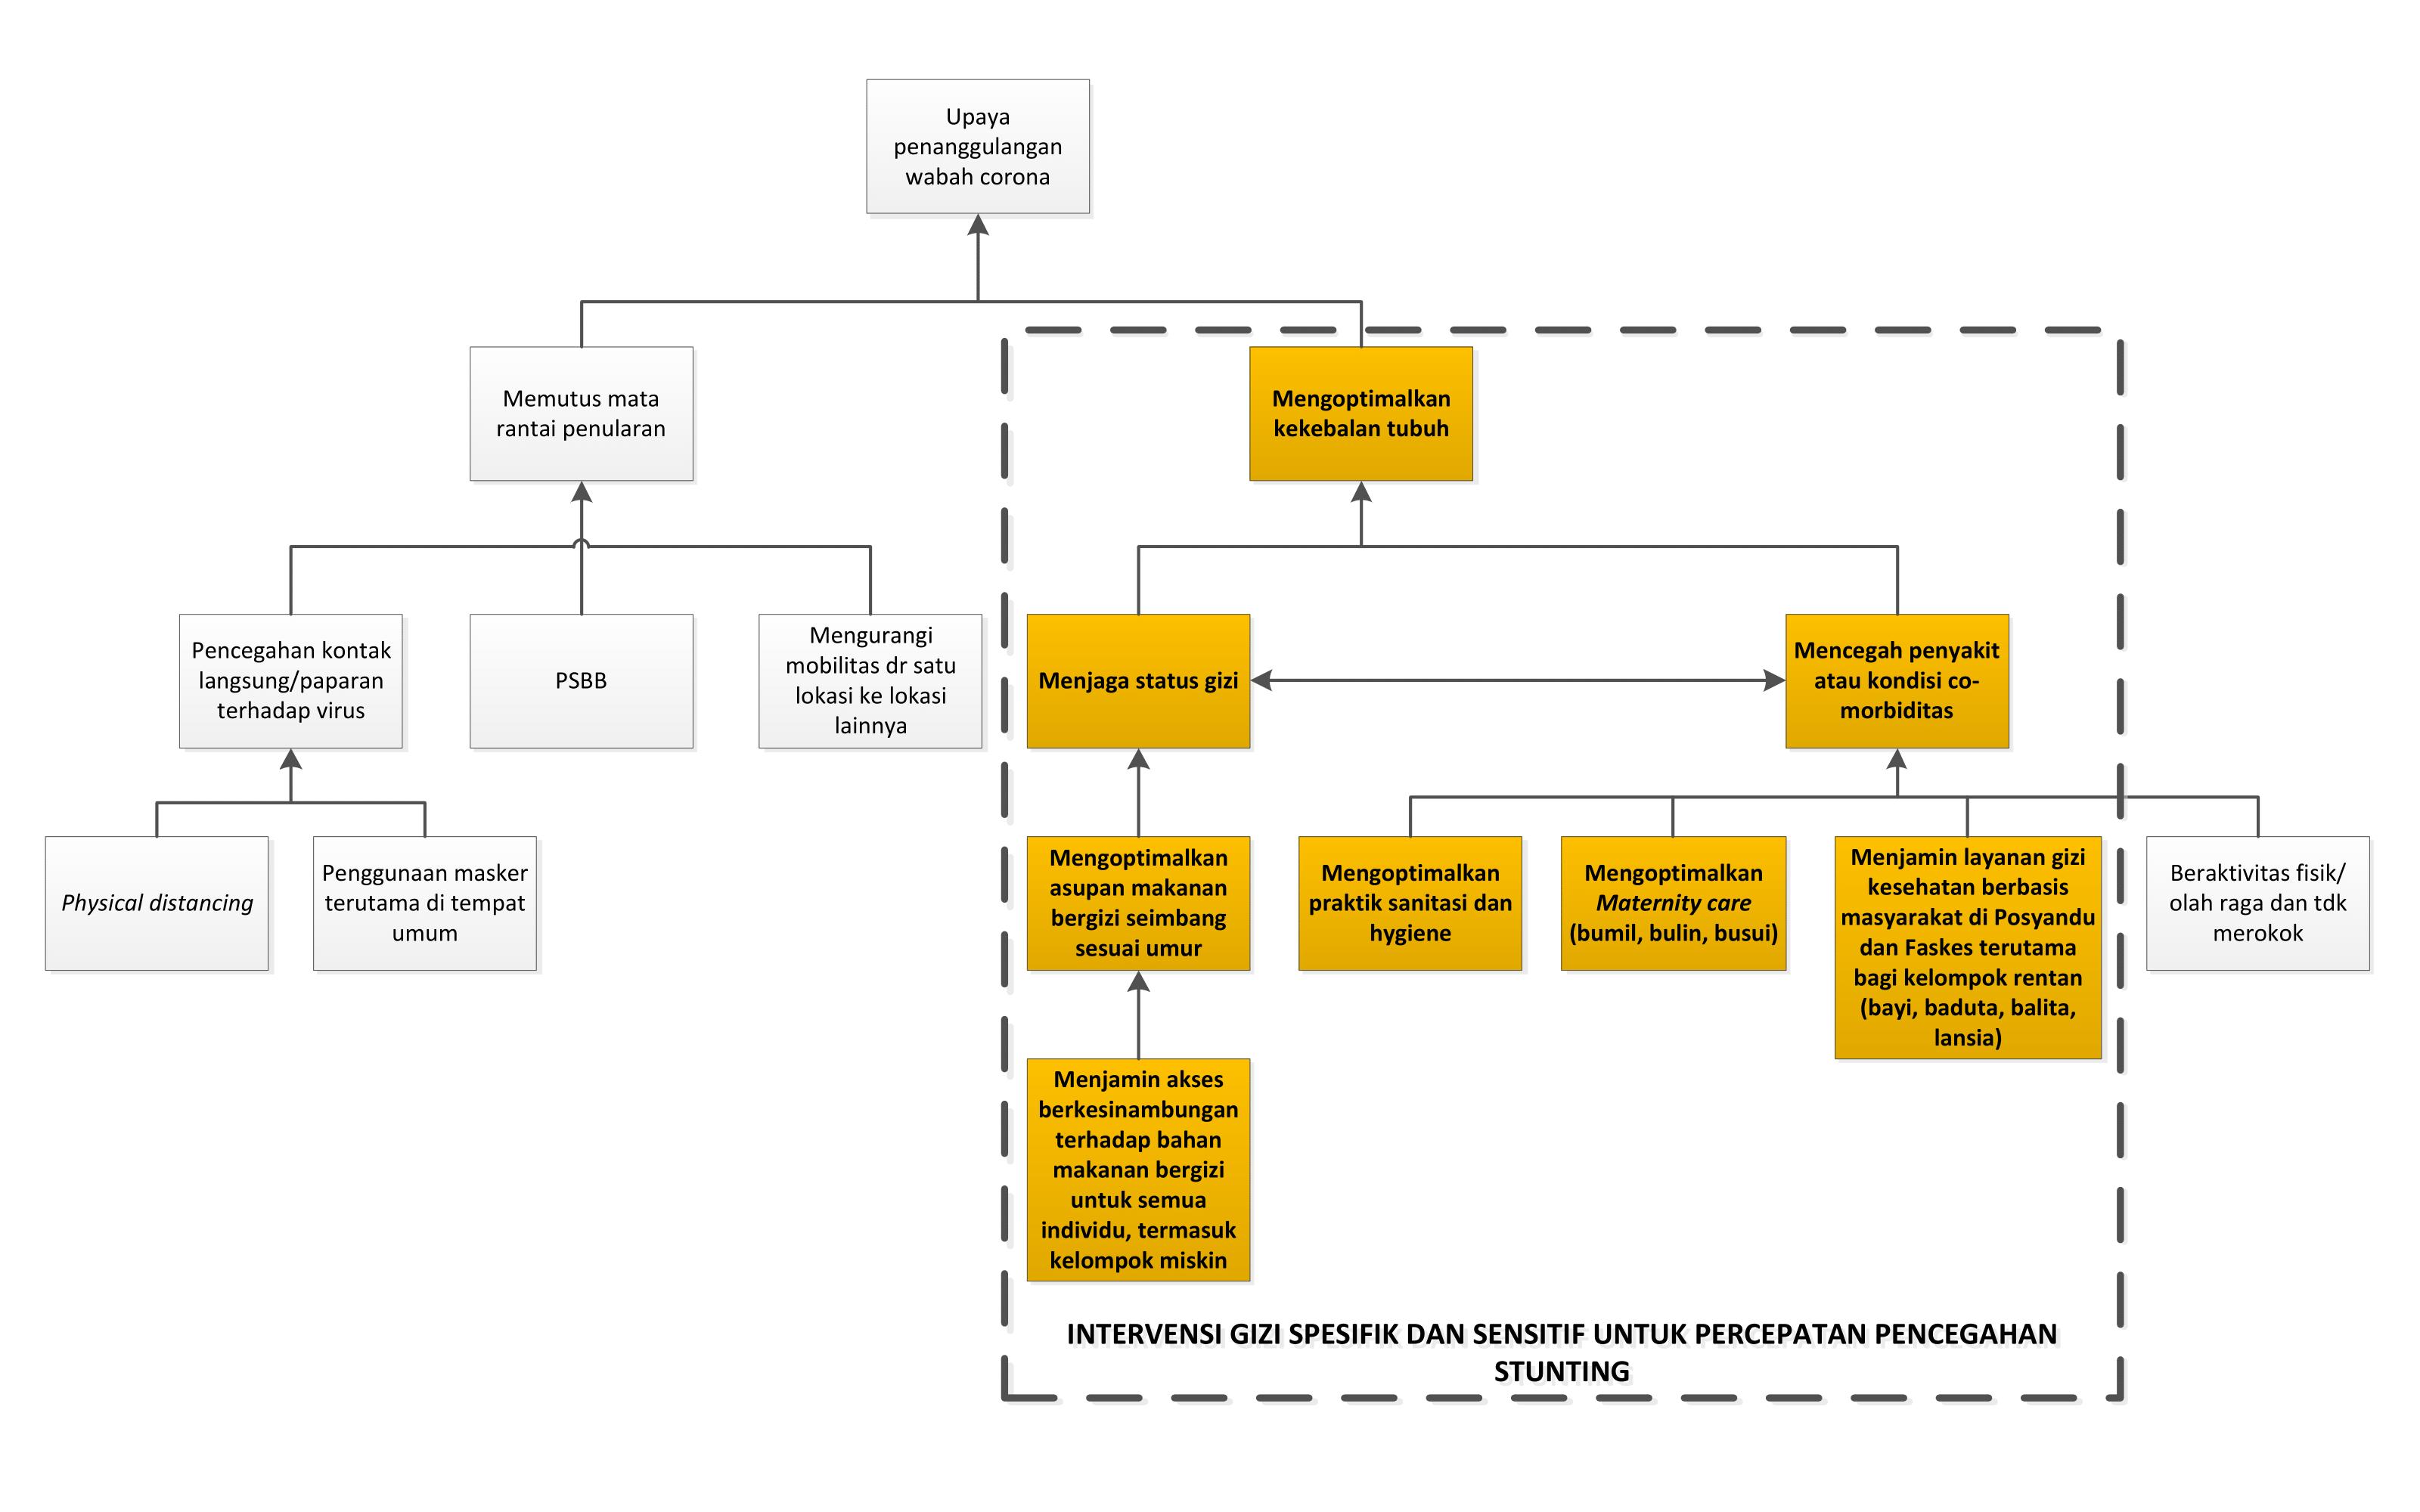 Skema Intervensi Gizi Spesifik dan Sensitif dalam Upaya Penanggulangan Wabah Corona